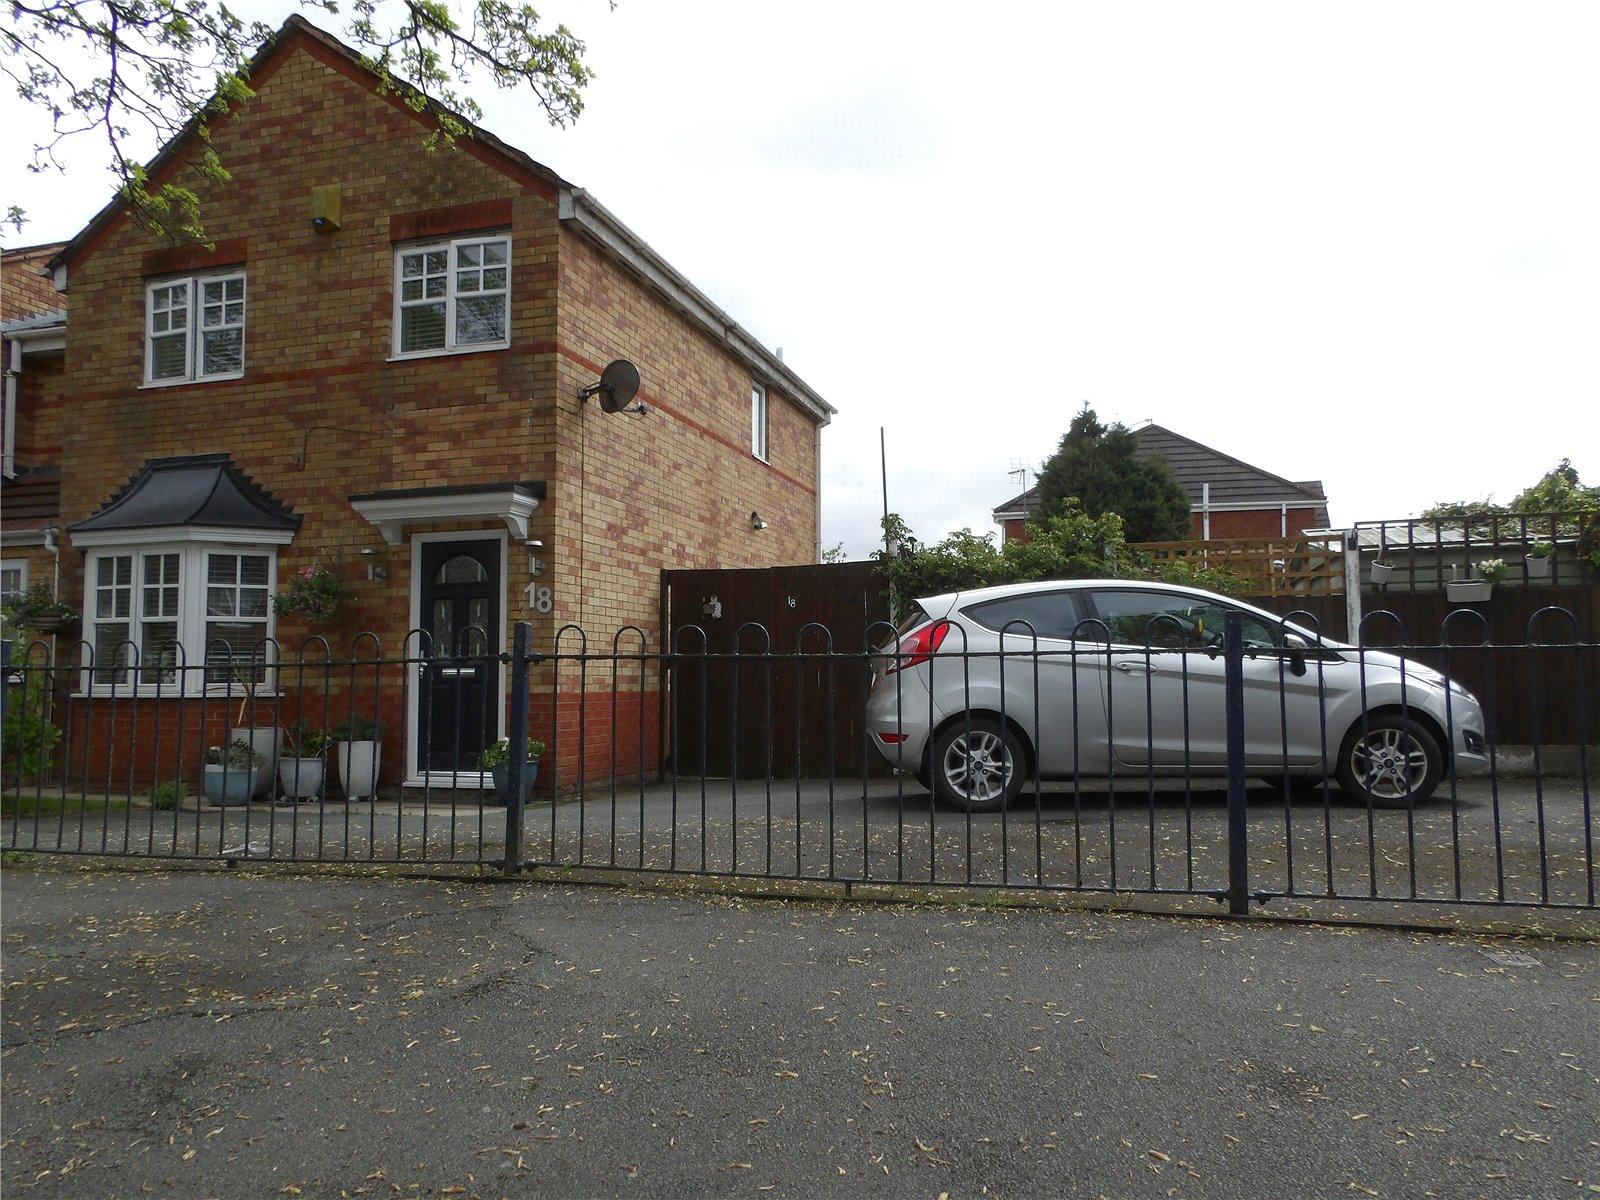 Finch Lane, Knotty Ash, Liverpool, L14 9QA